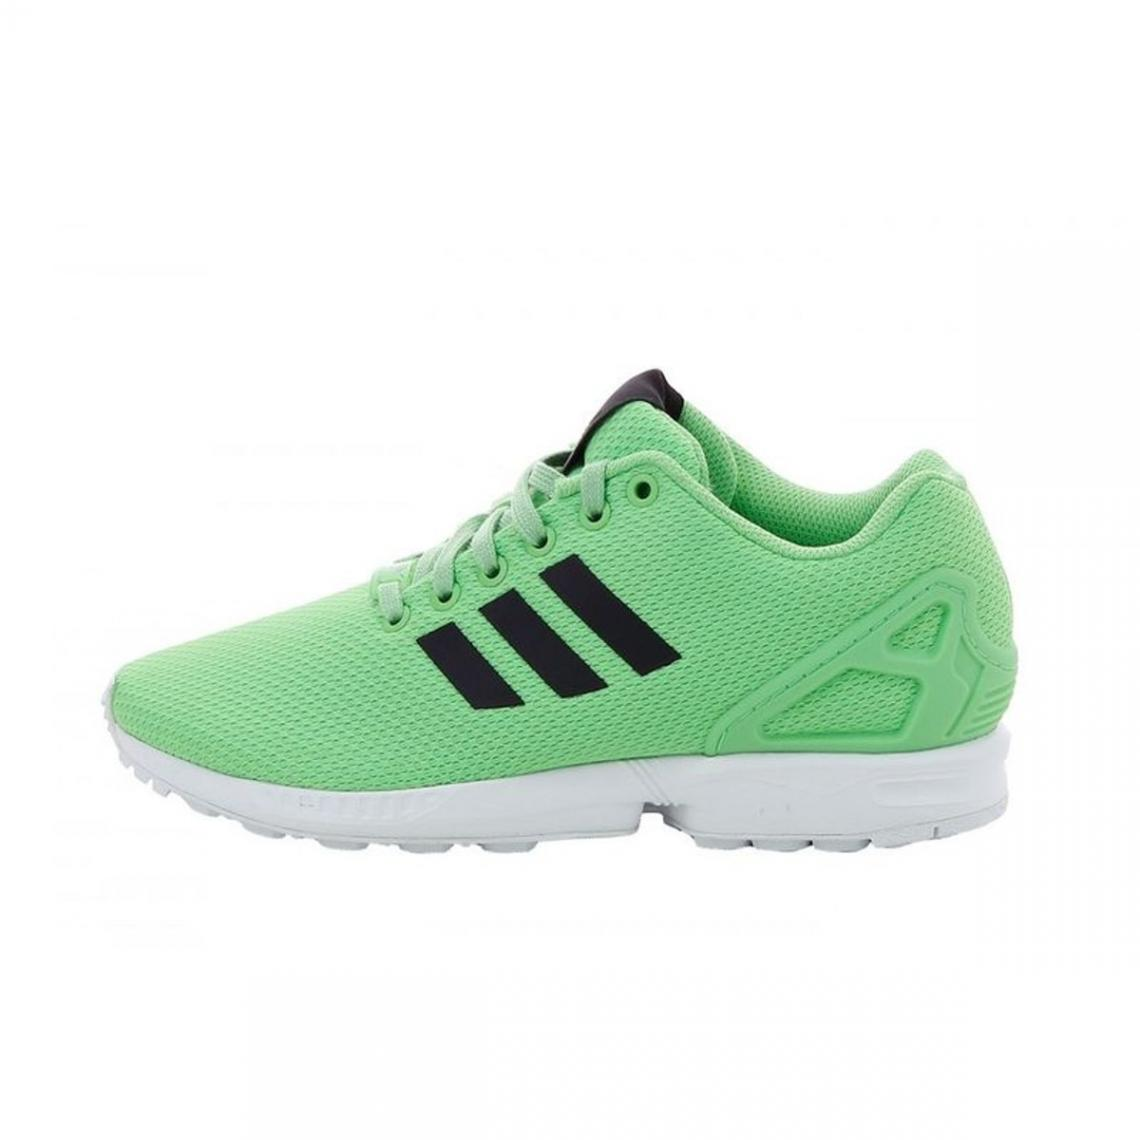 adidas zx flux Vert enfant online